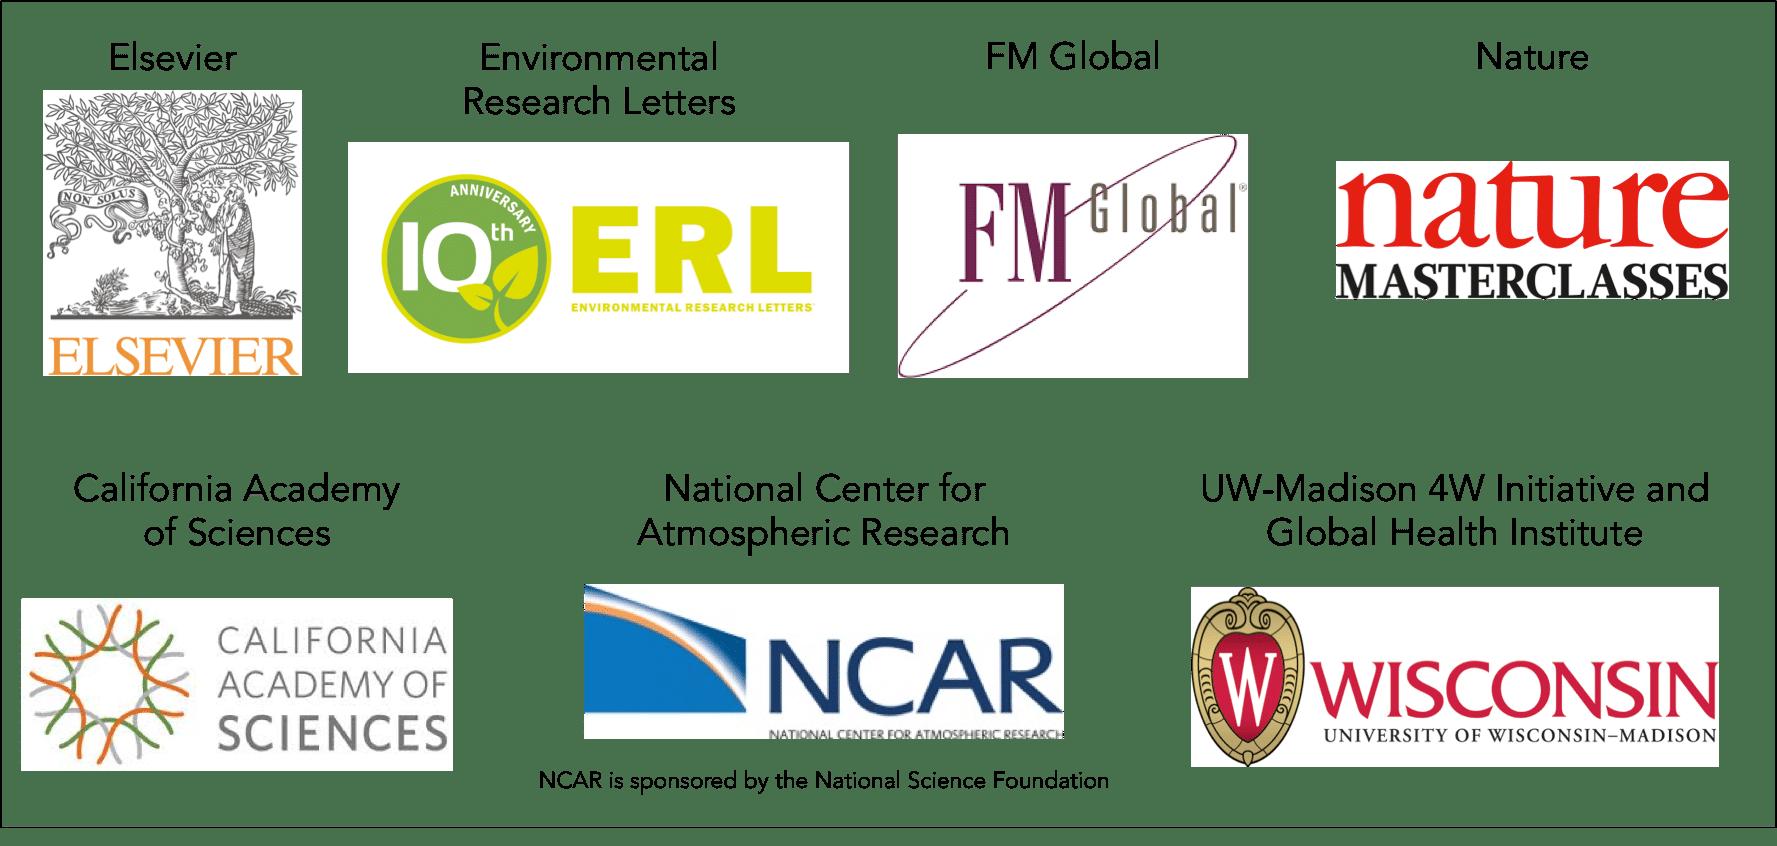 agu16-sponsors-logos-11-3-16